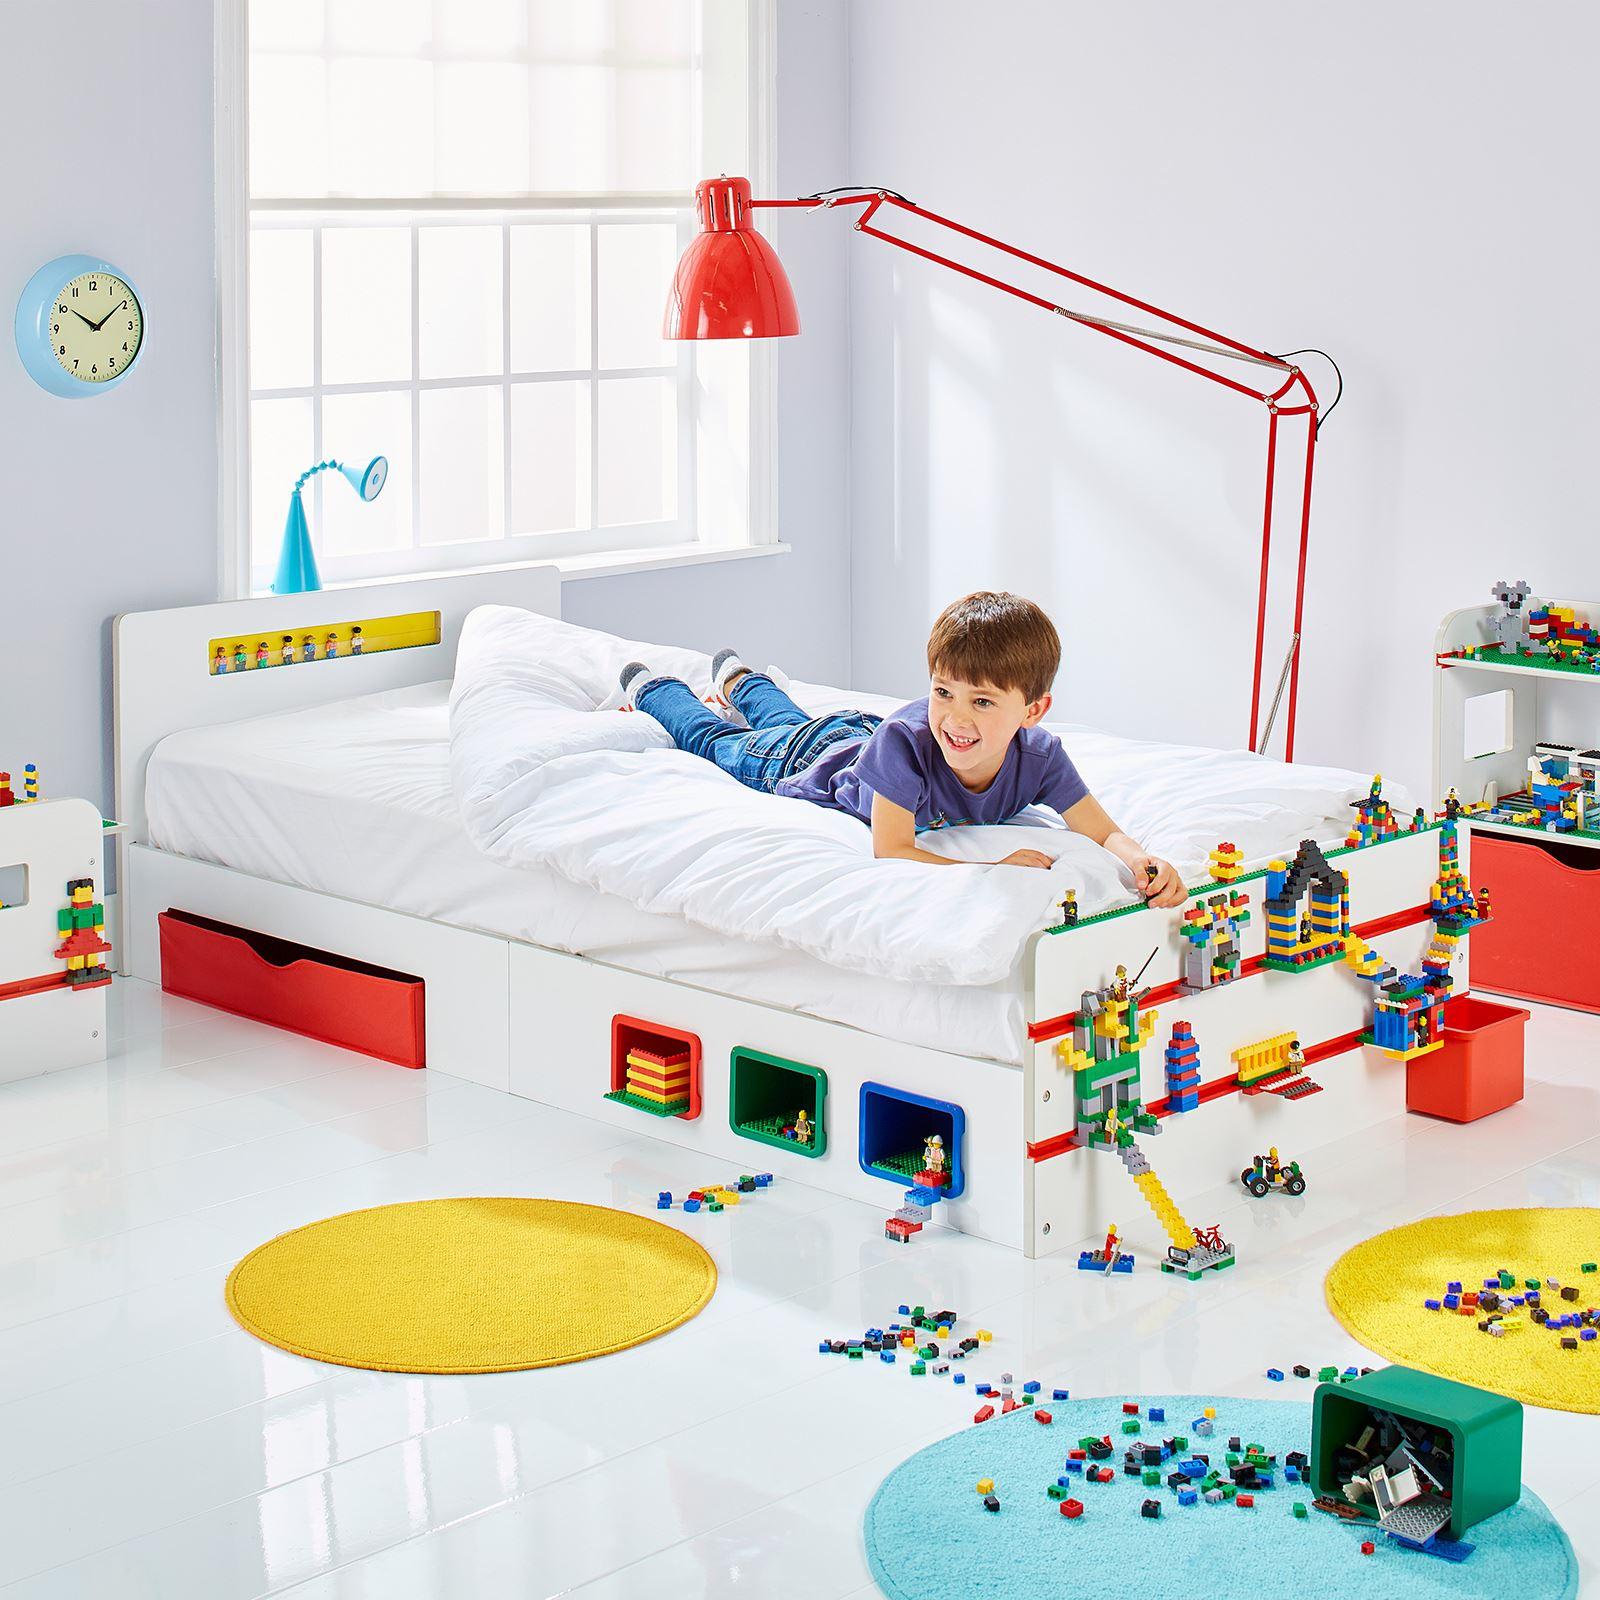 Room 2 Build Bedroom Kids Lego Single Bed With Storage